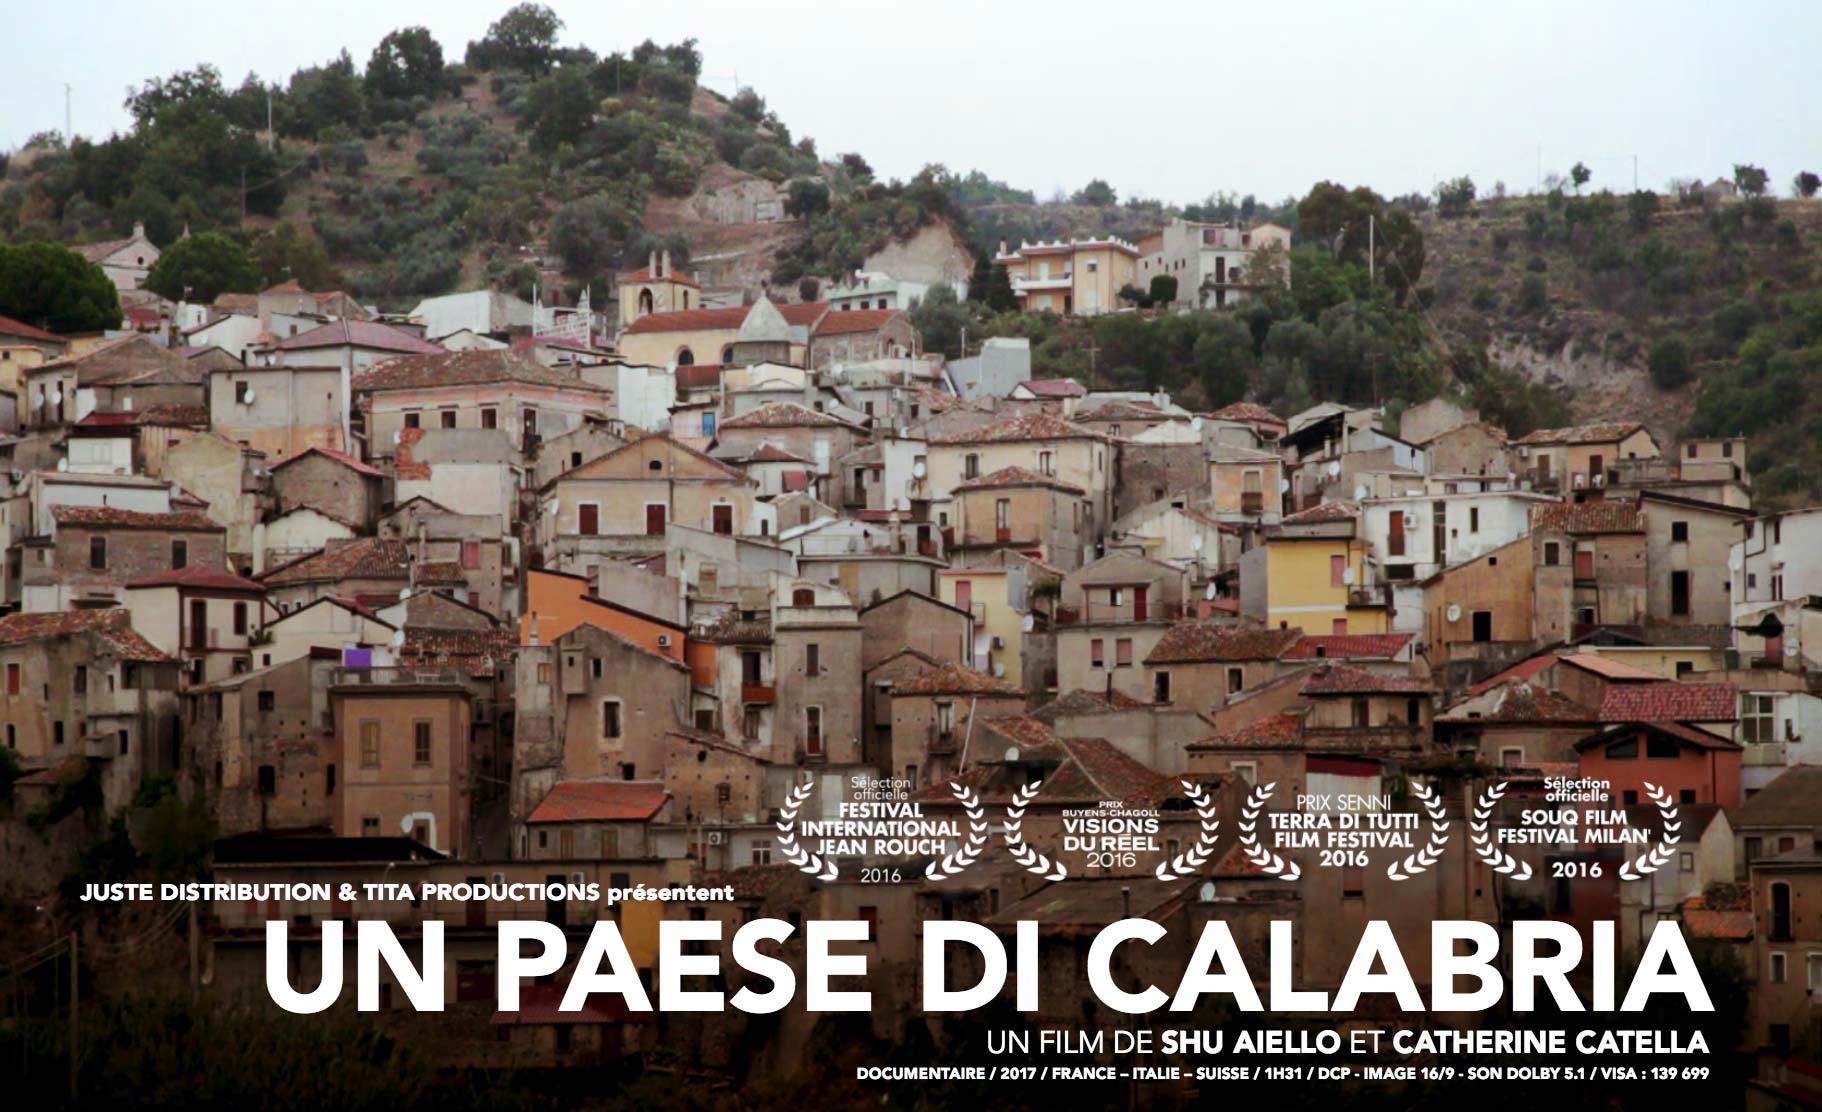 Riace in Calabria